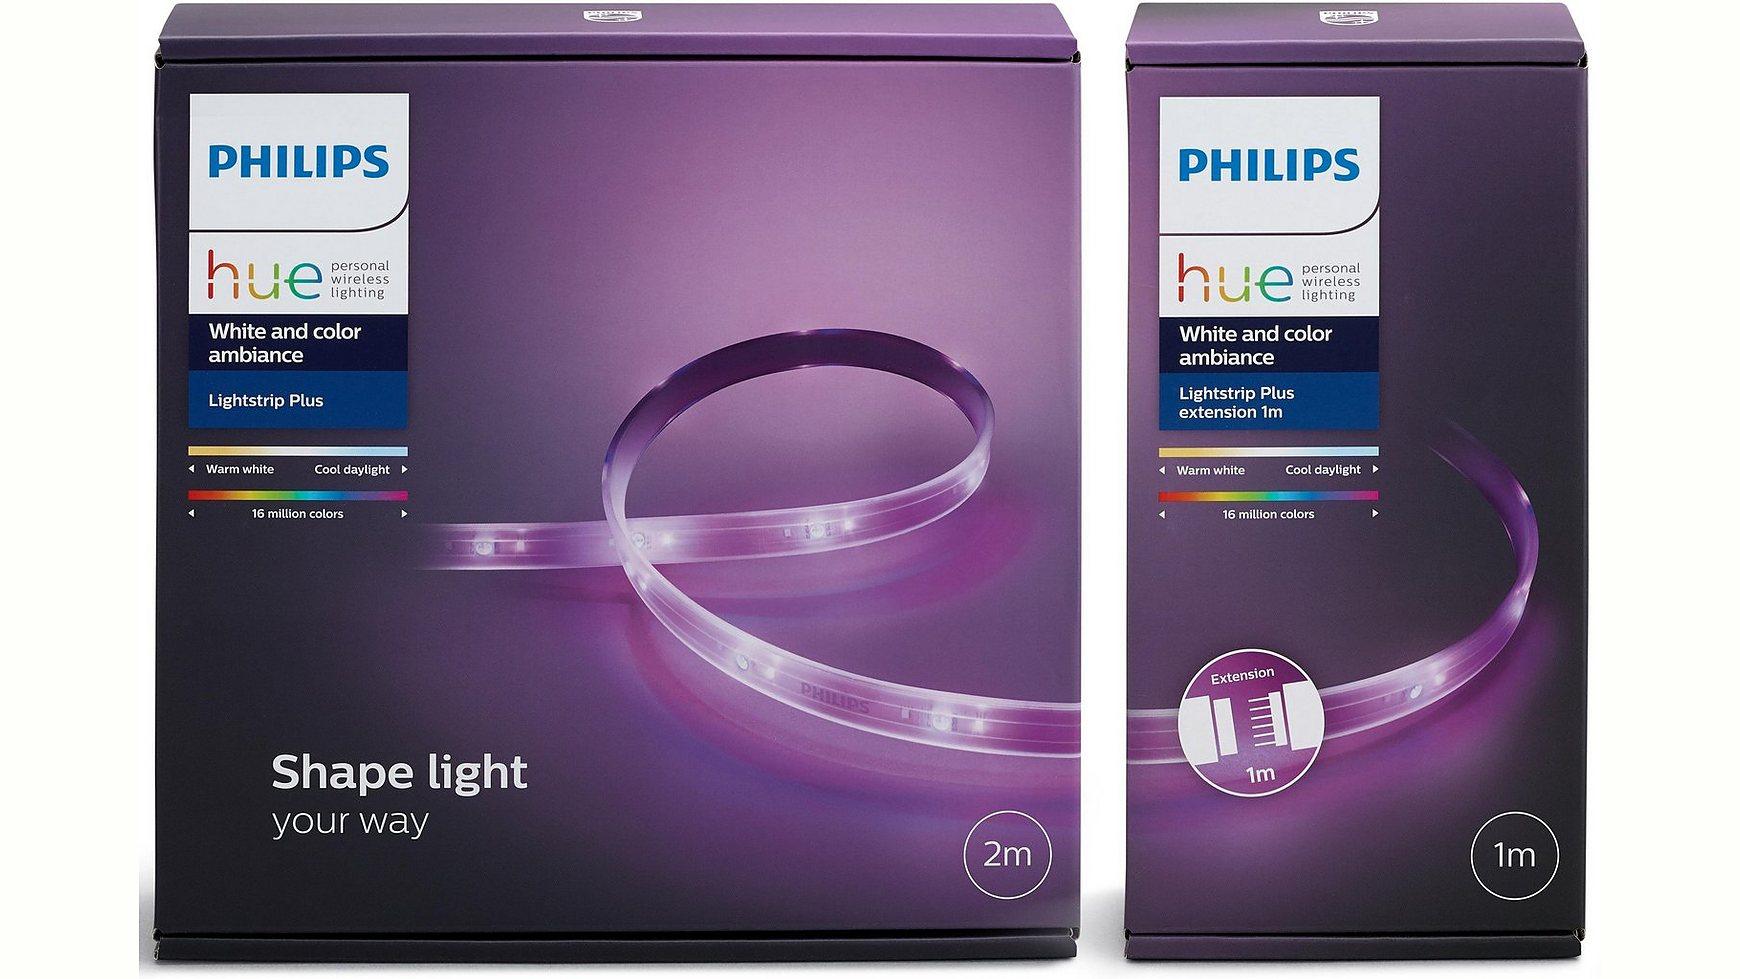 philips hue lightstrip plus 2m 1m erweiterung. Black Bedroom Furniture Sets. Home Design Ideas